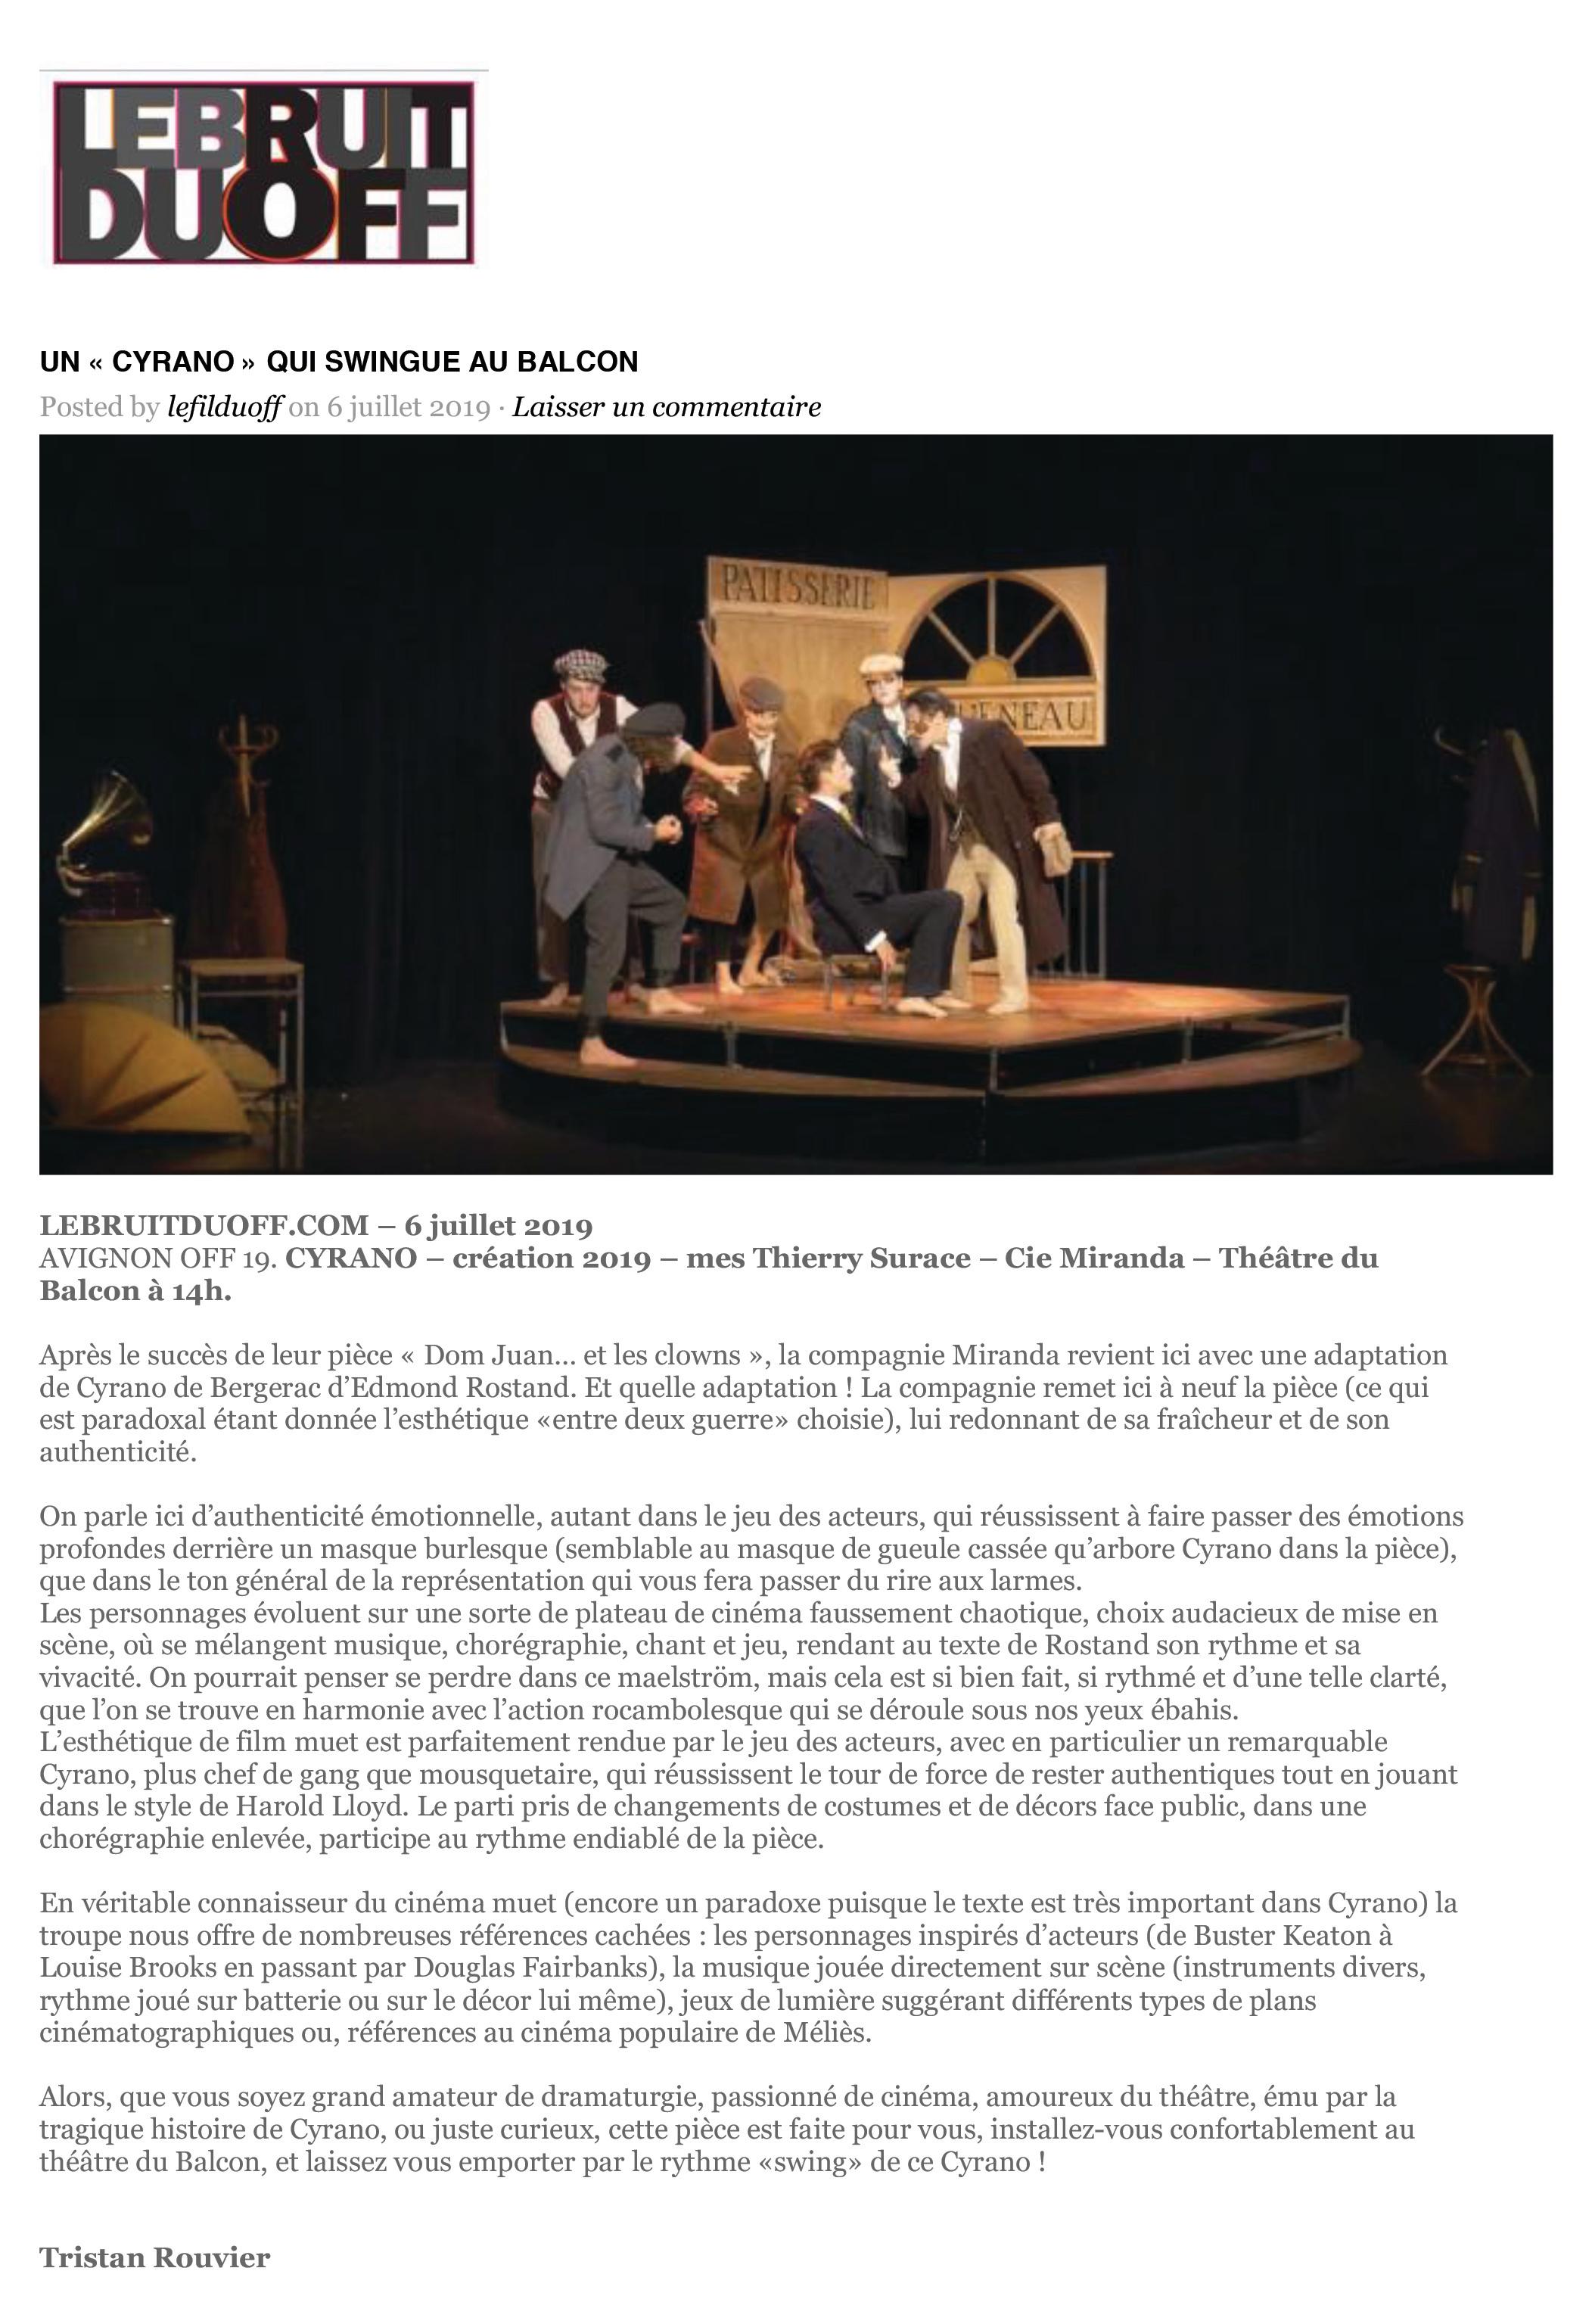 Bruit du Off - Avignon 2019 - Cyrano